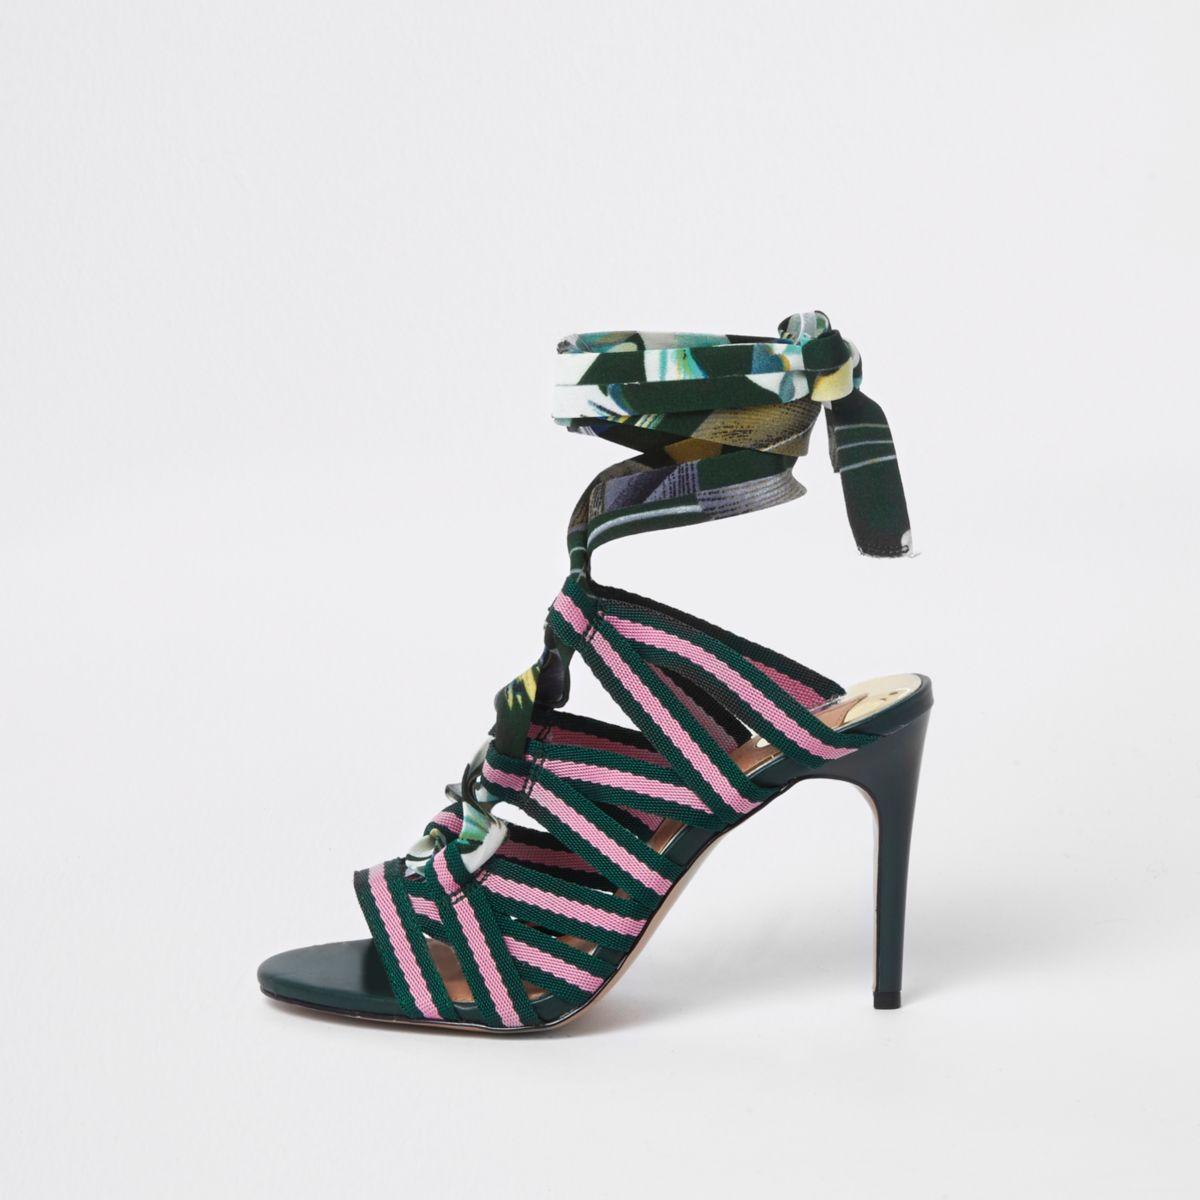 River Island Sandals - green 2peWFS